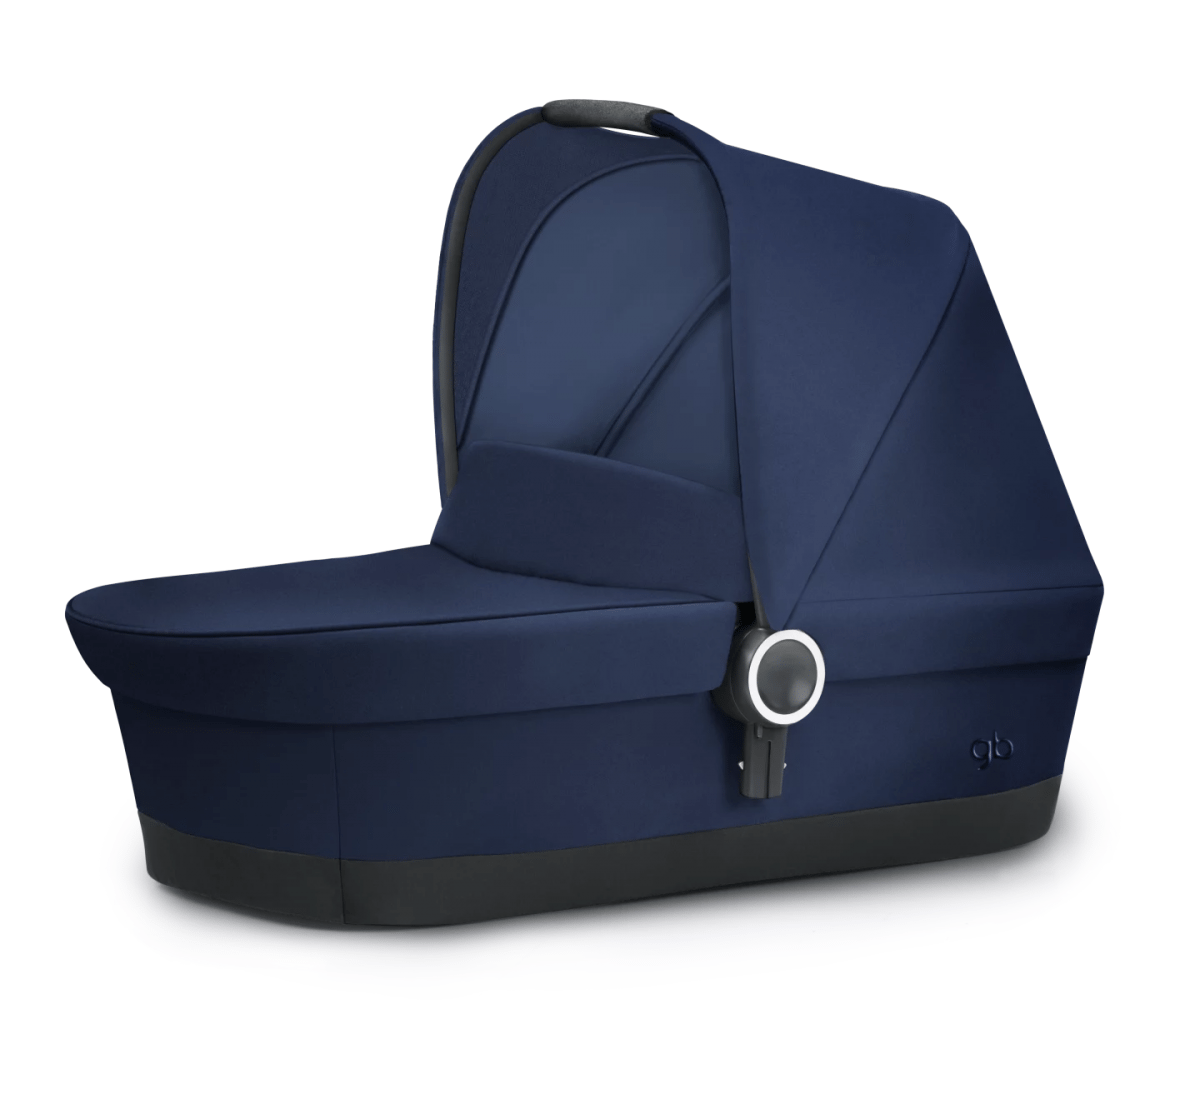 product-Maris-Cot-Seaport-Blue-194-148_sli1z5